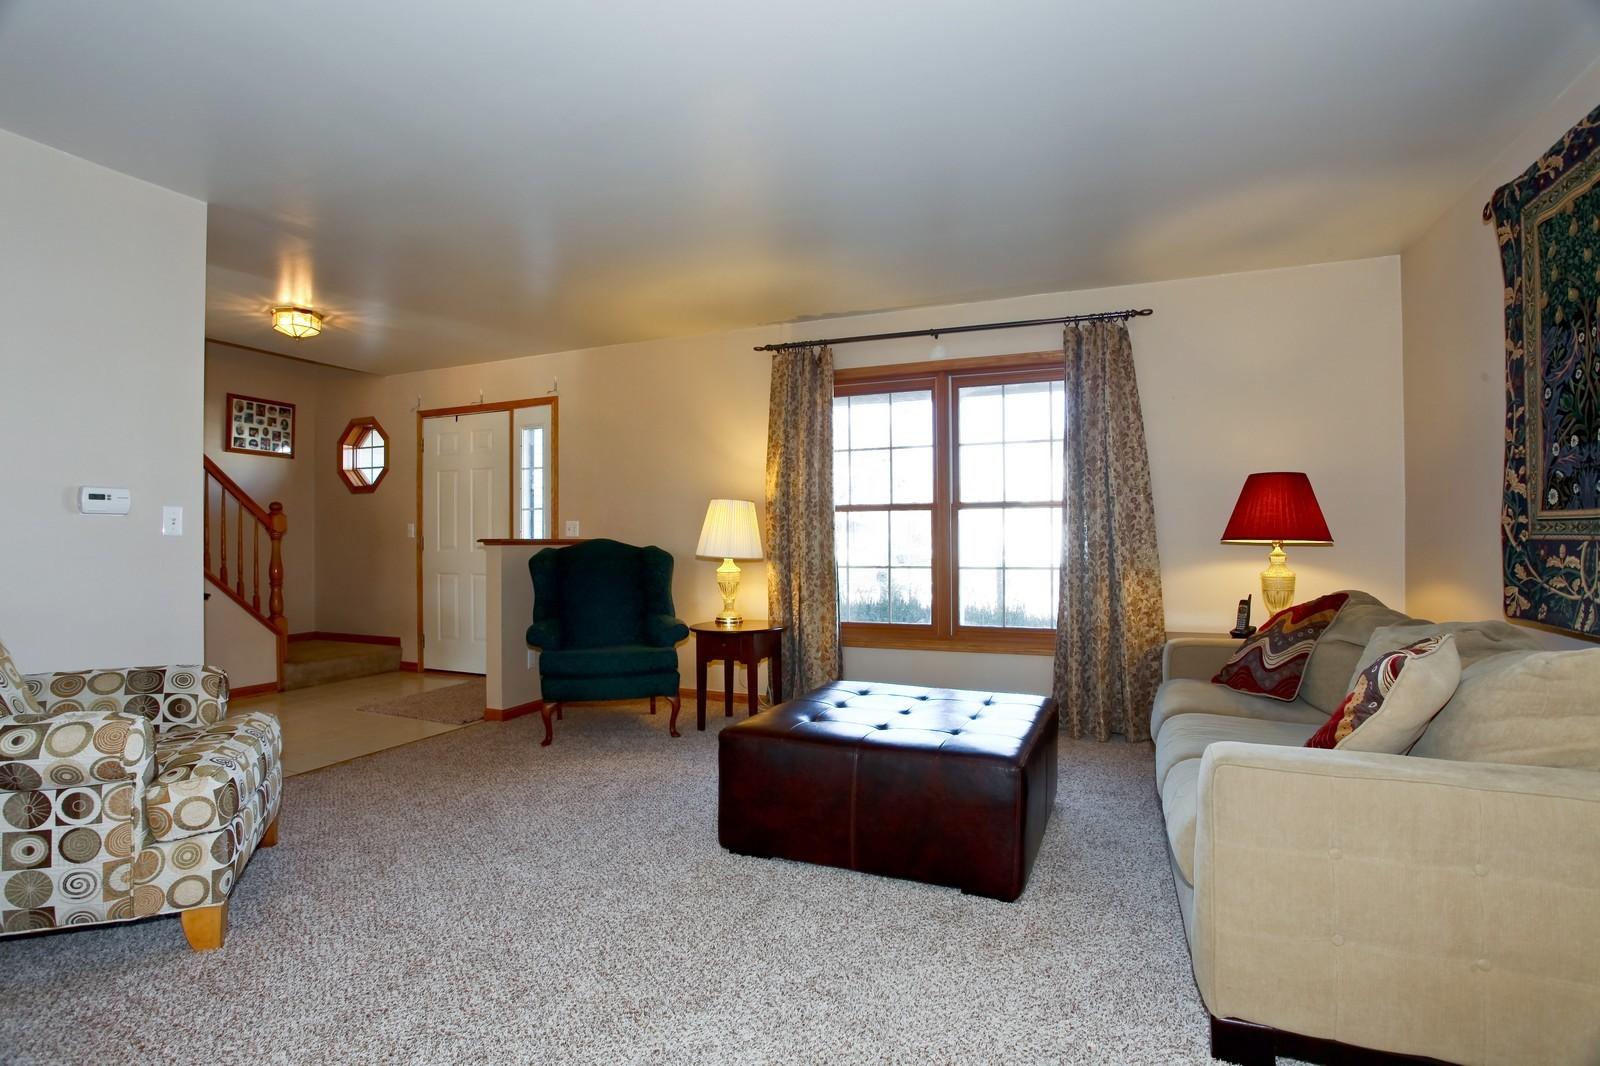 Real Estate Photography - 39W539 Schoolhouse Ln, Geneva, IL, 60134 - Living Room